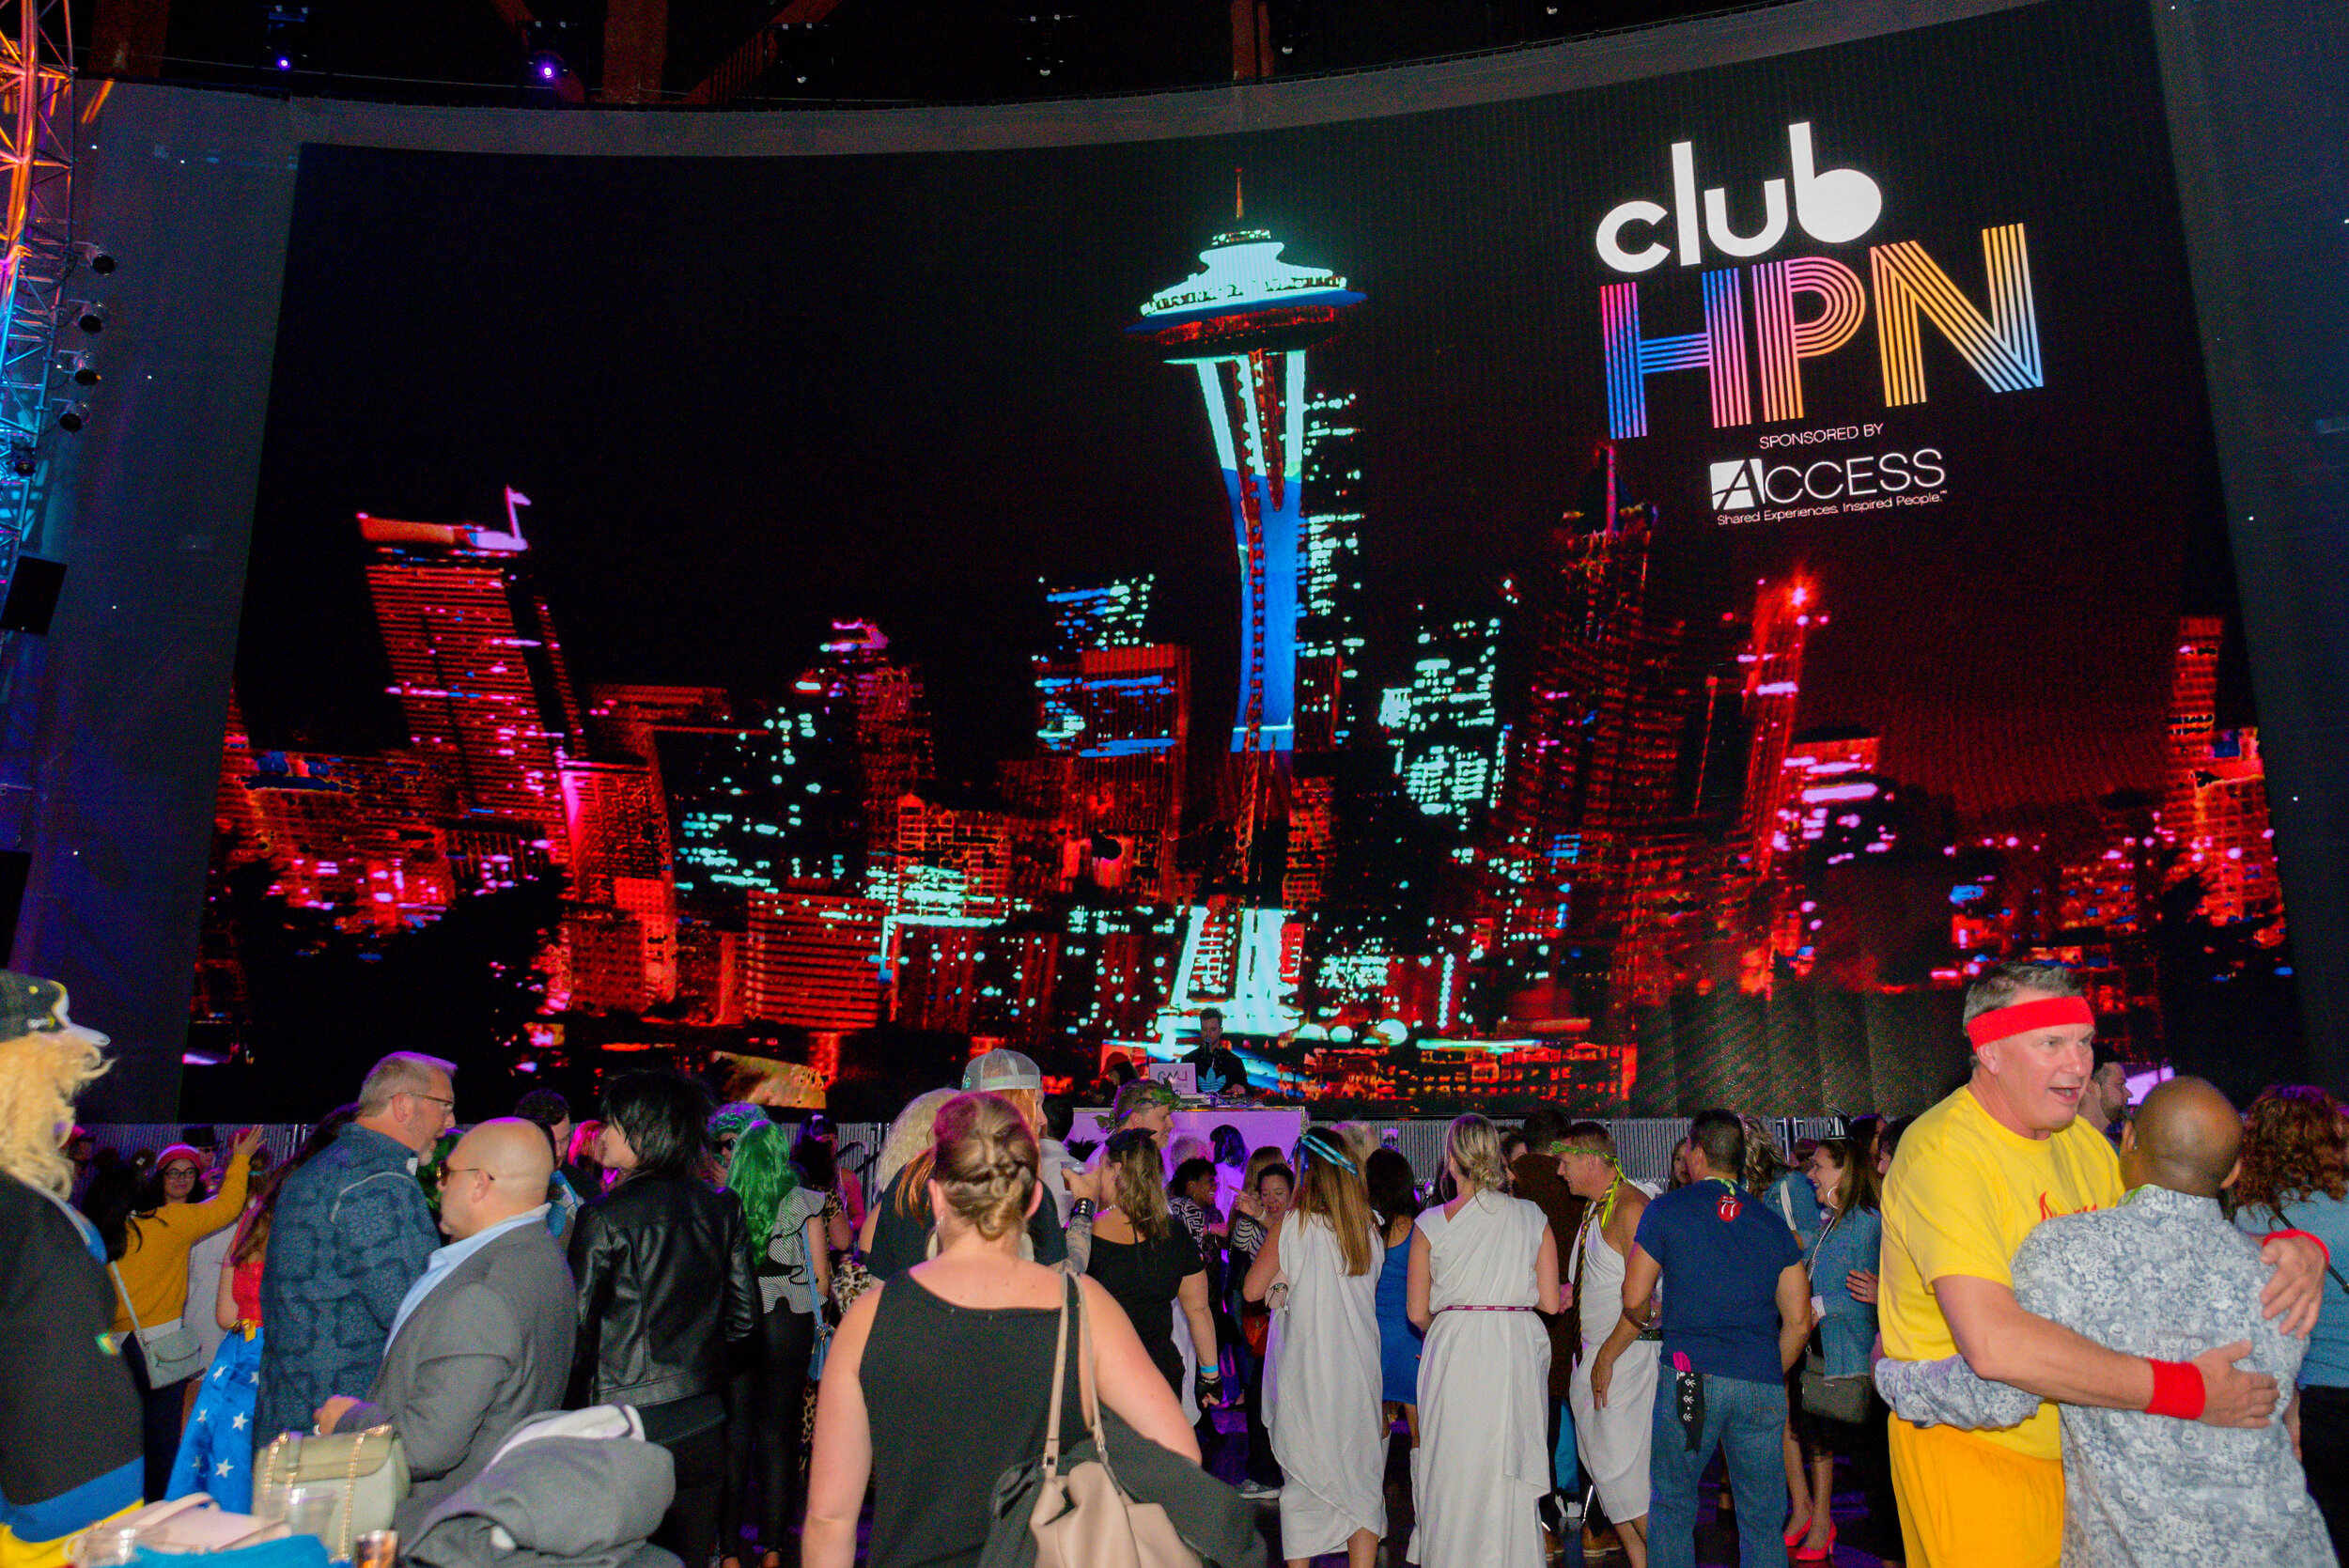 HPNGlobalPartnerConference147_KelliPricePhotography_SeattleWAOctober19.jpg